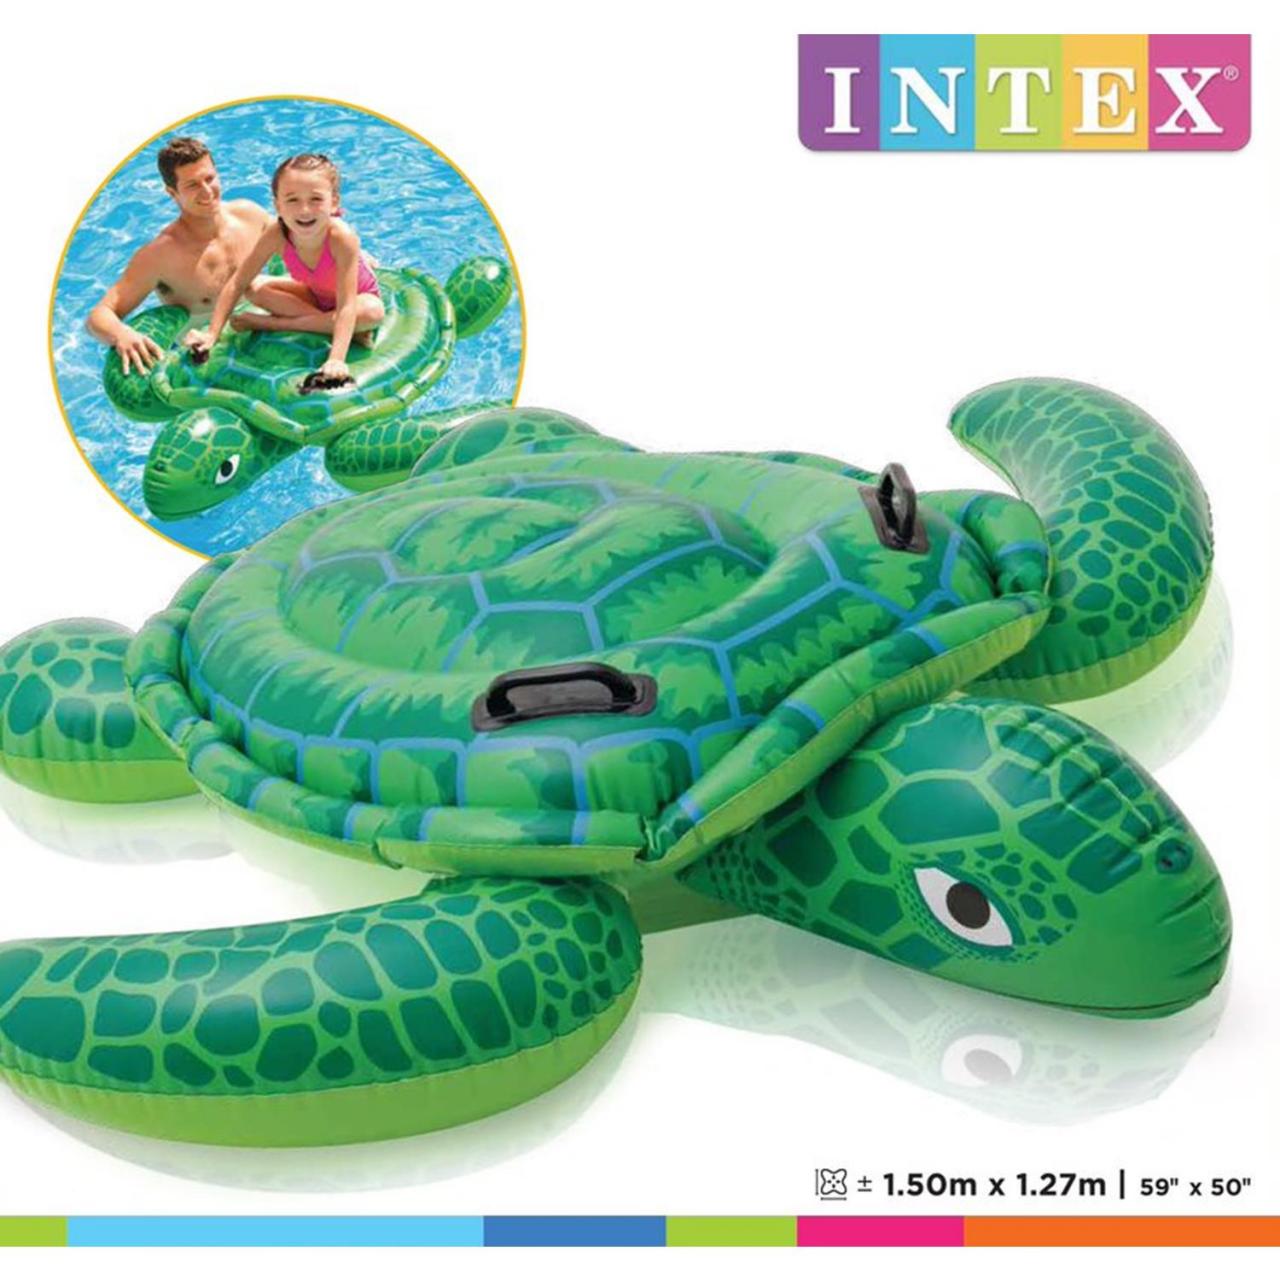 Intex 57524NP - Lil' Sea Turtle Ride-On, 150 x 127 cm